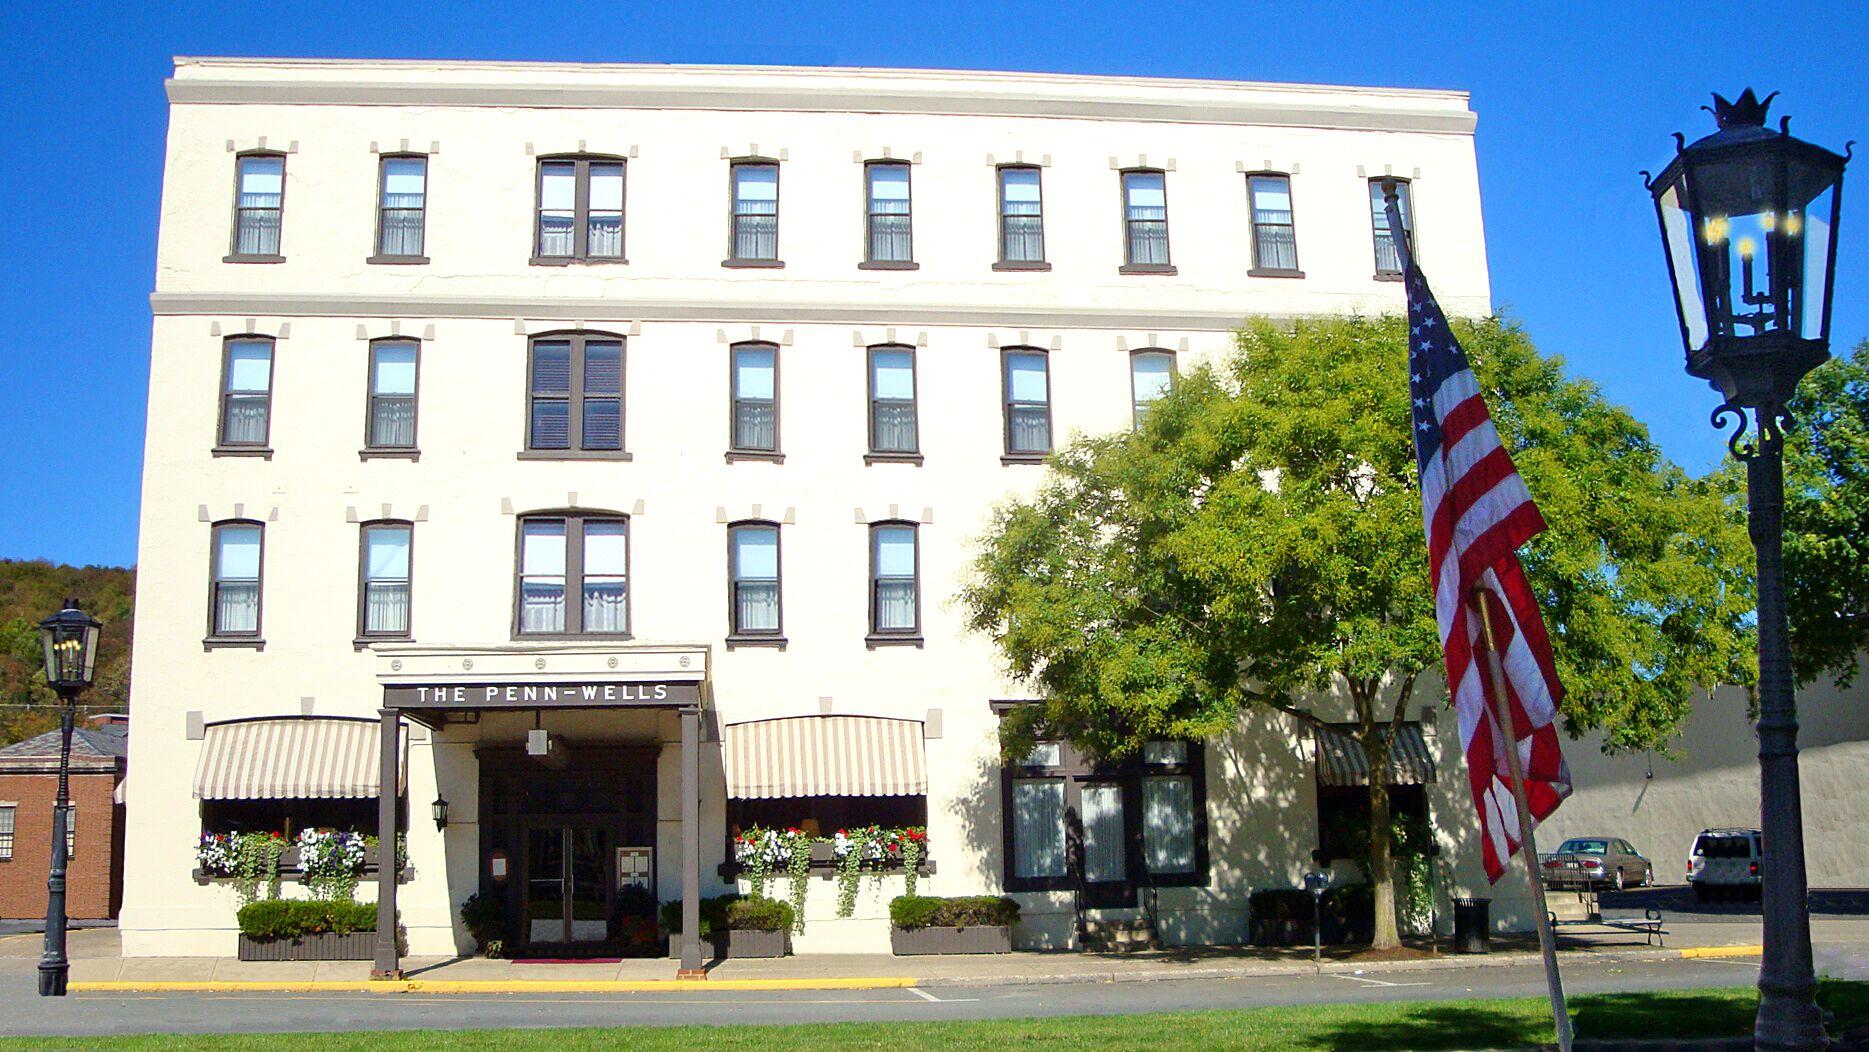 Penn Wells Hotel Amp Lodge Reception Venues Wellsboro Pa